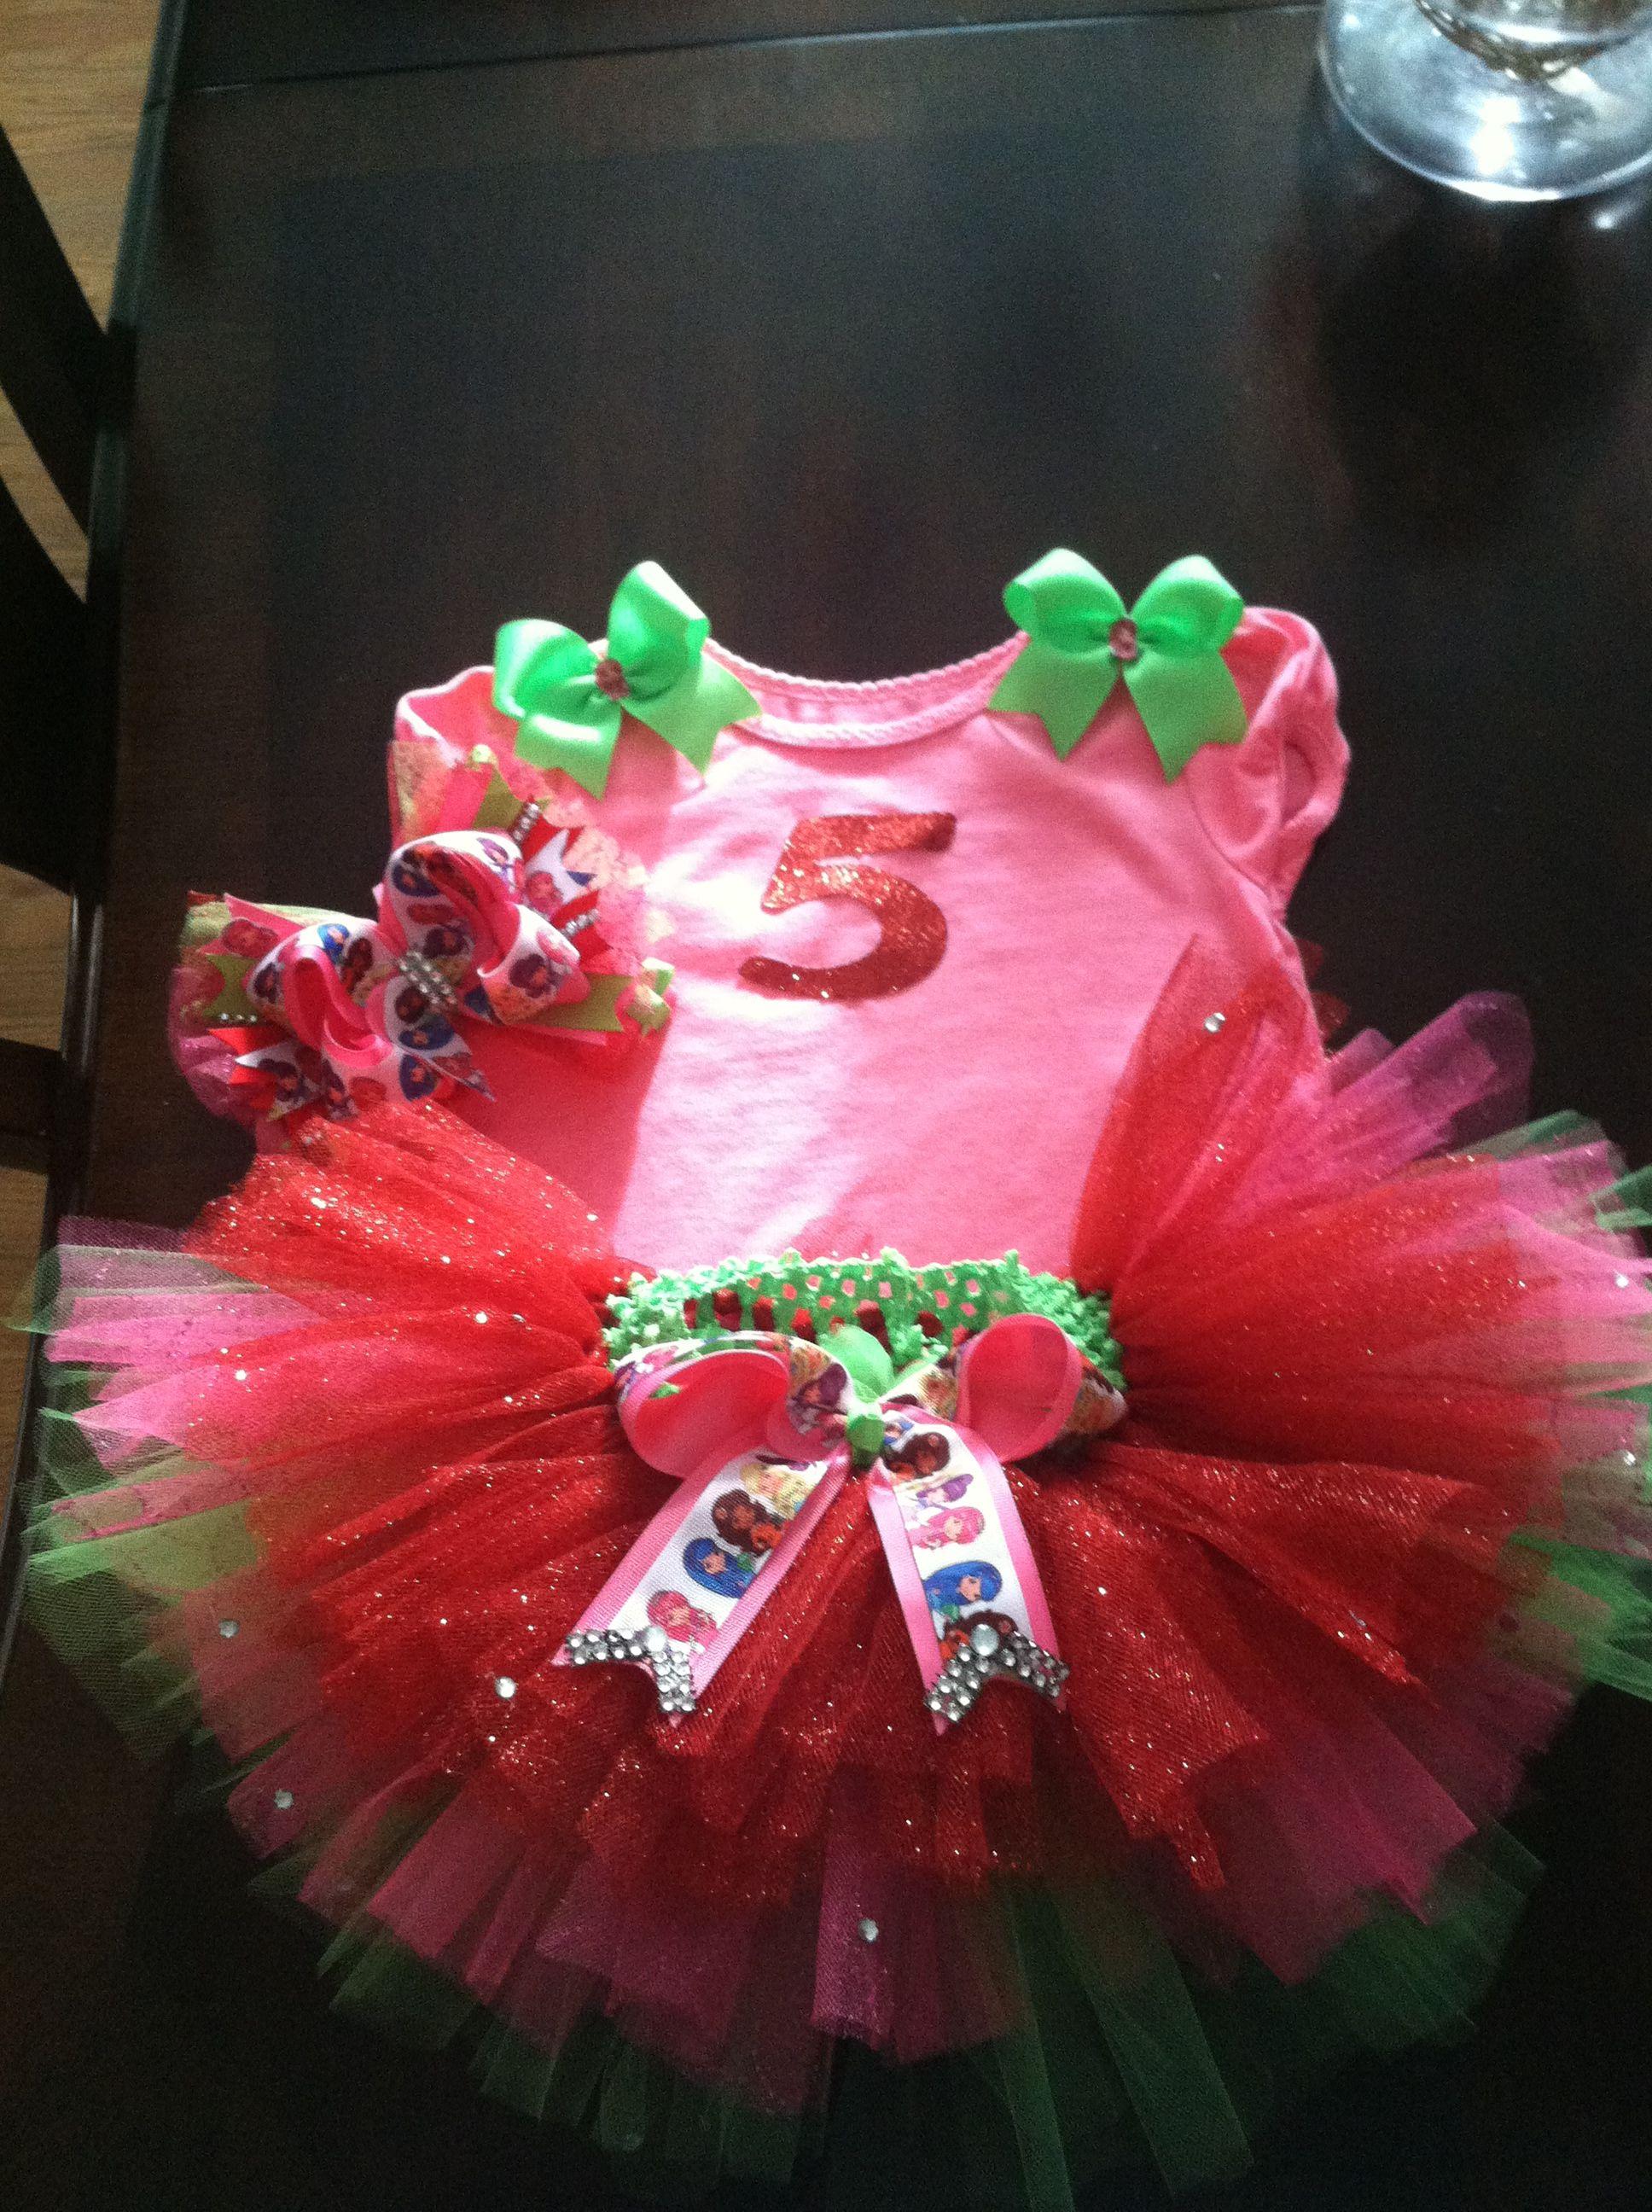 Strawberry shortcake theme birthday party 5 year old tutu set.   Three pc $35 by Veronica Arreola.